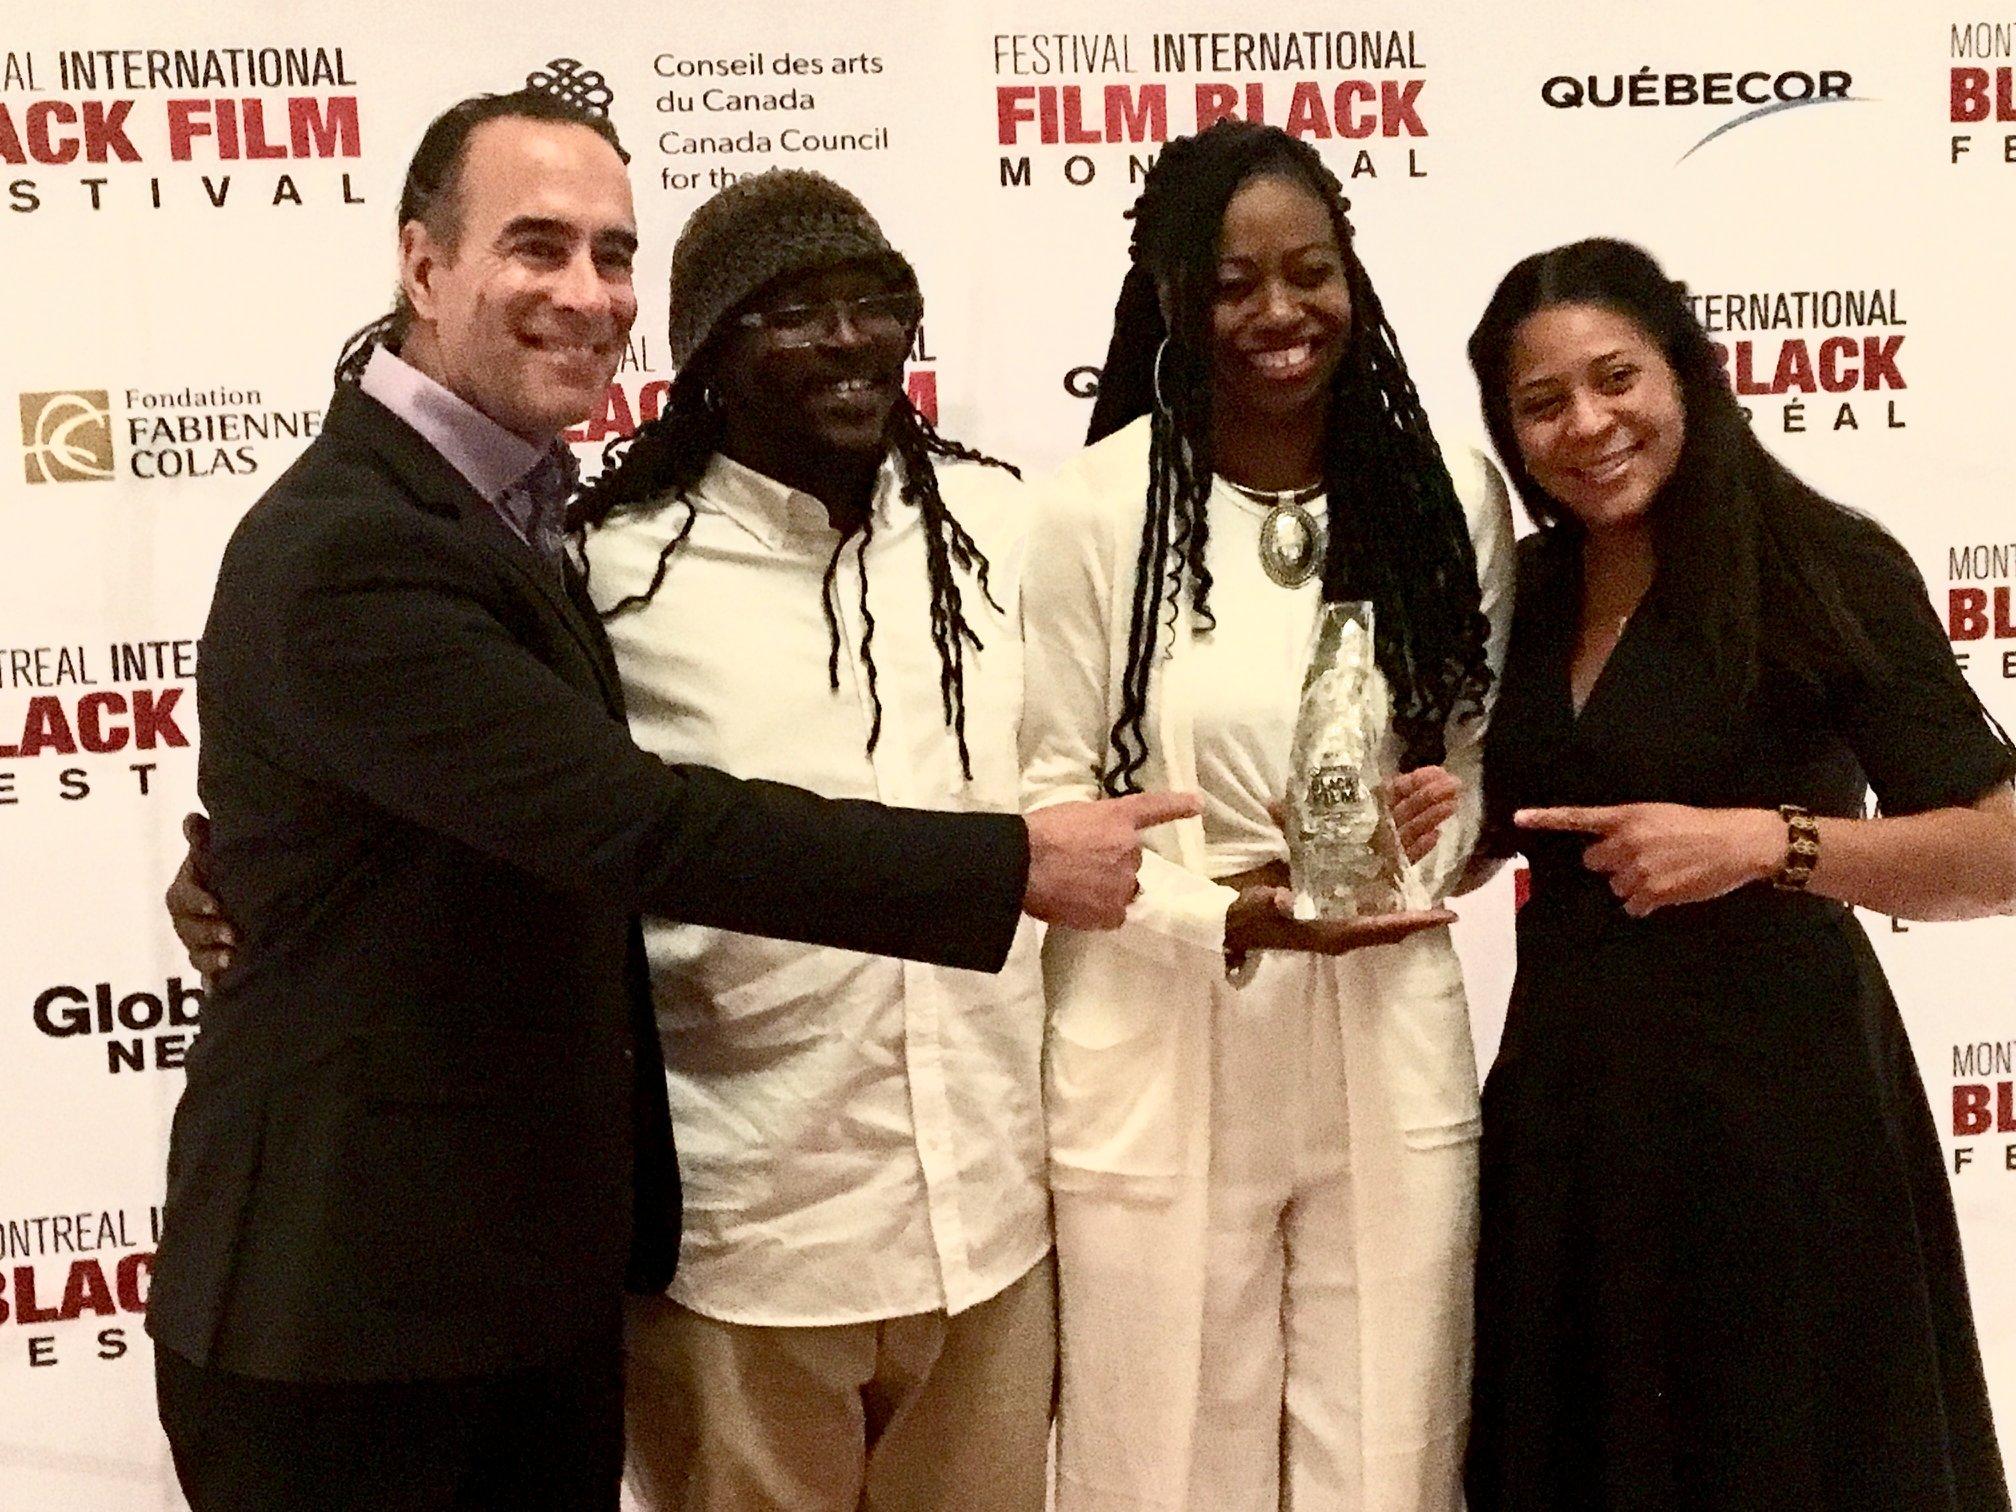 Best Documentary Film-Montreal